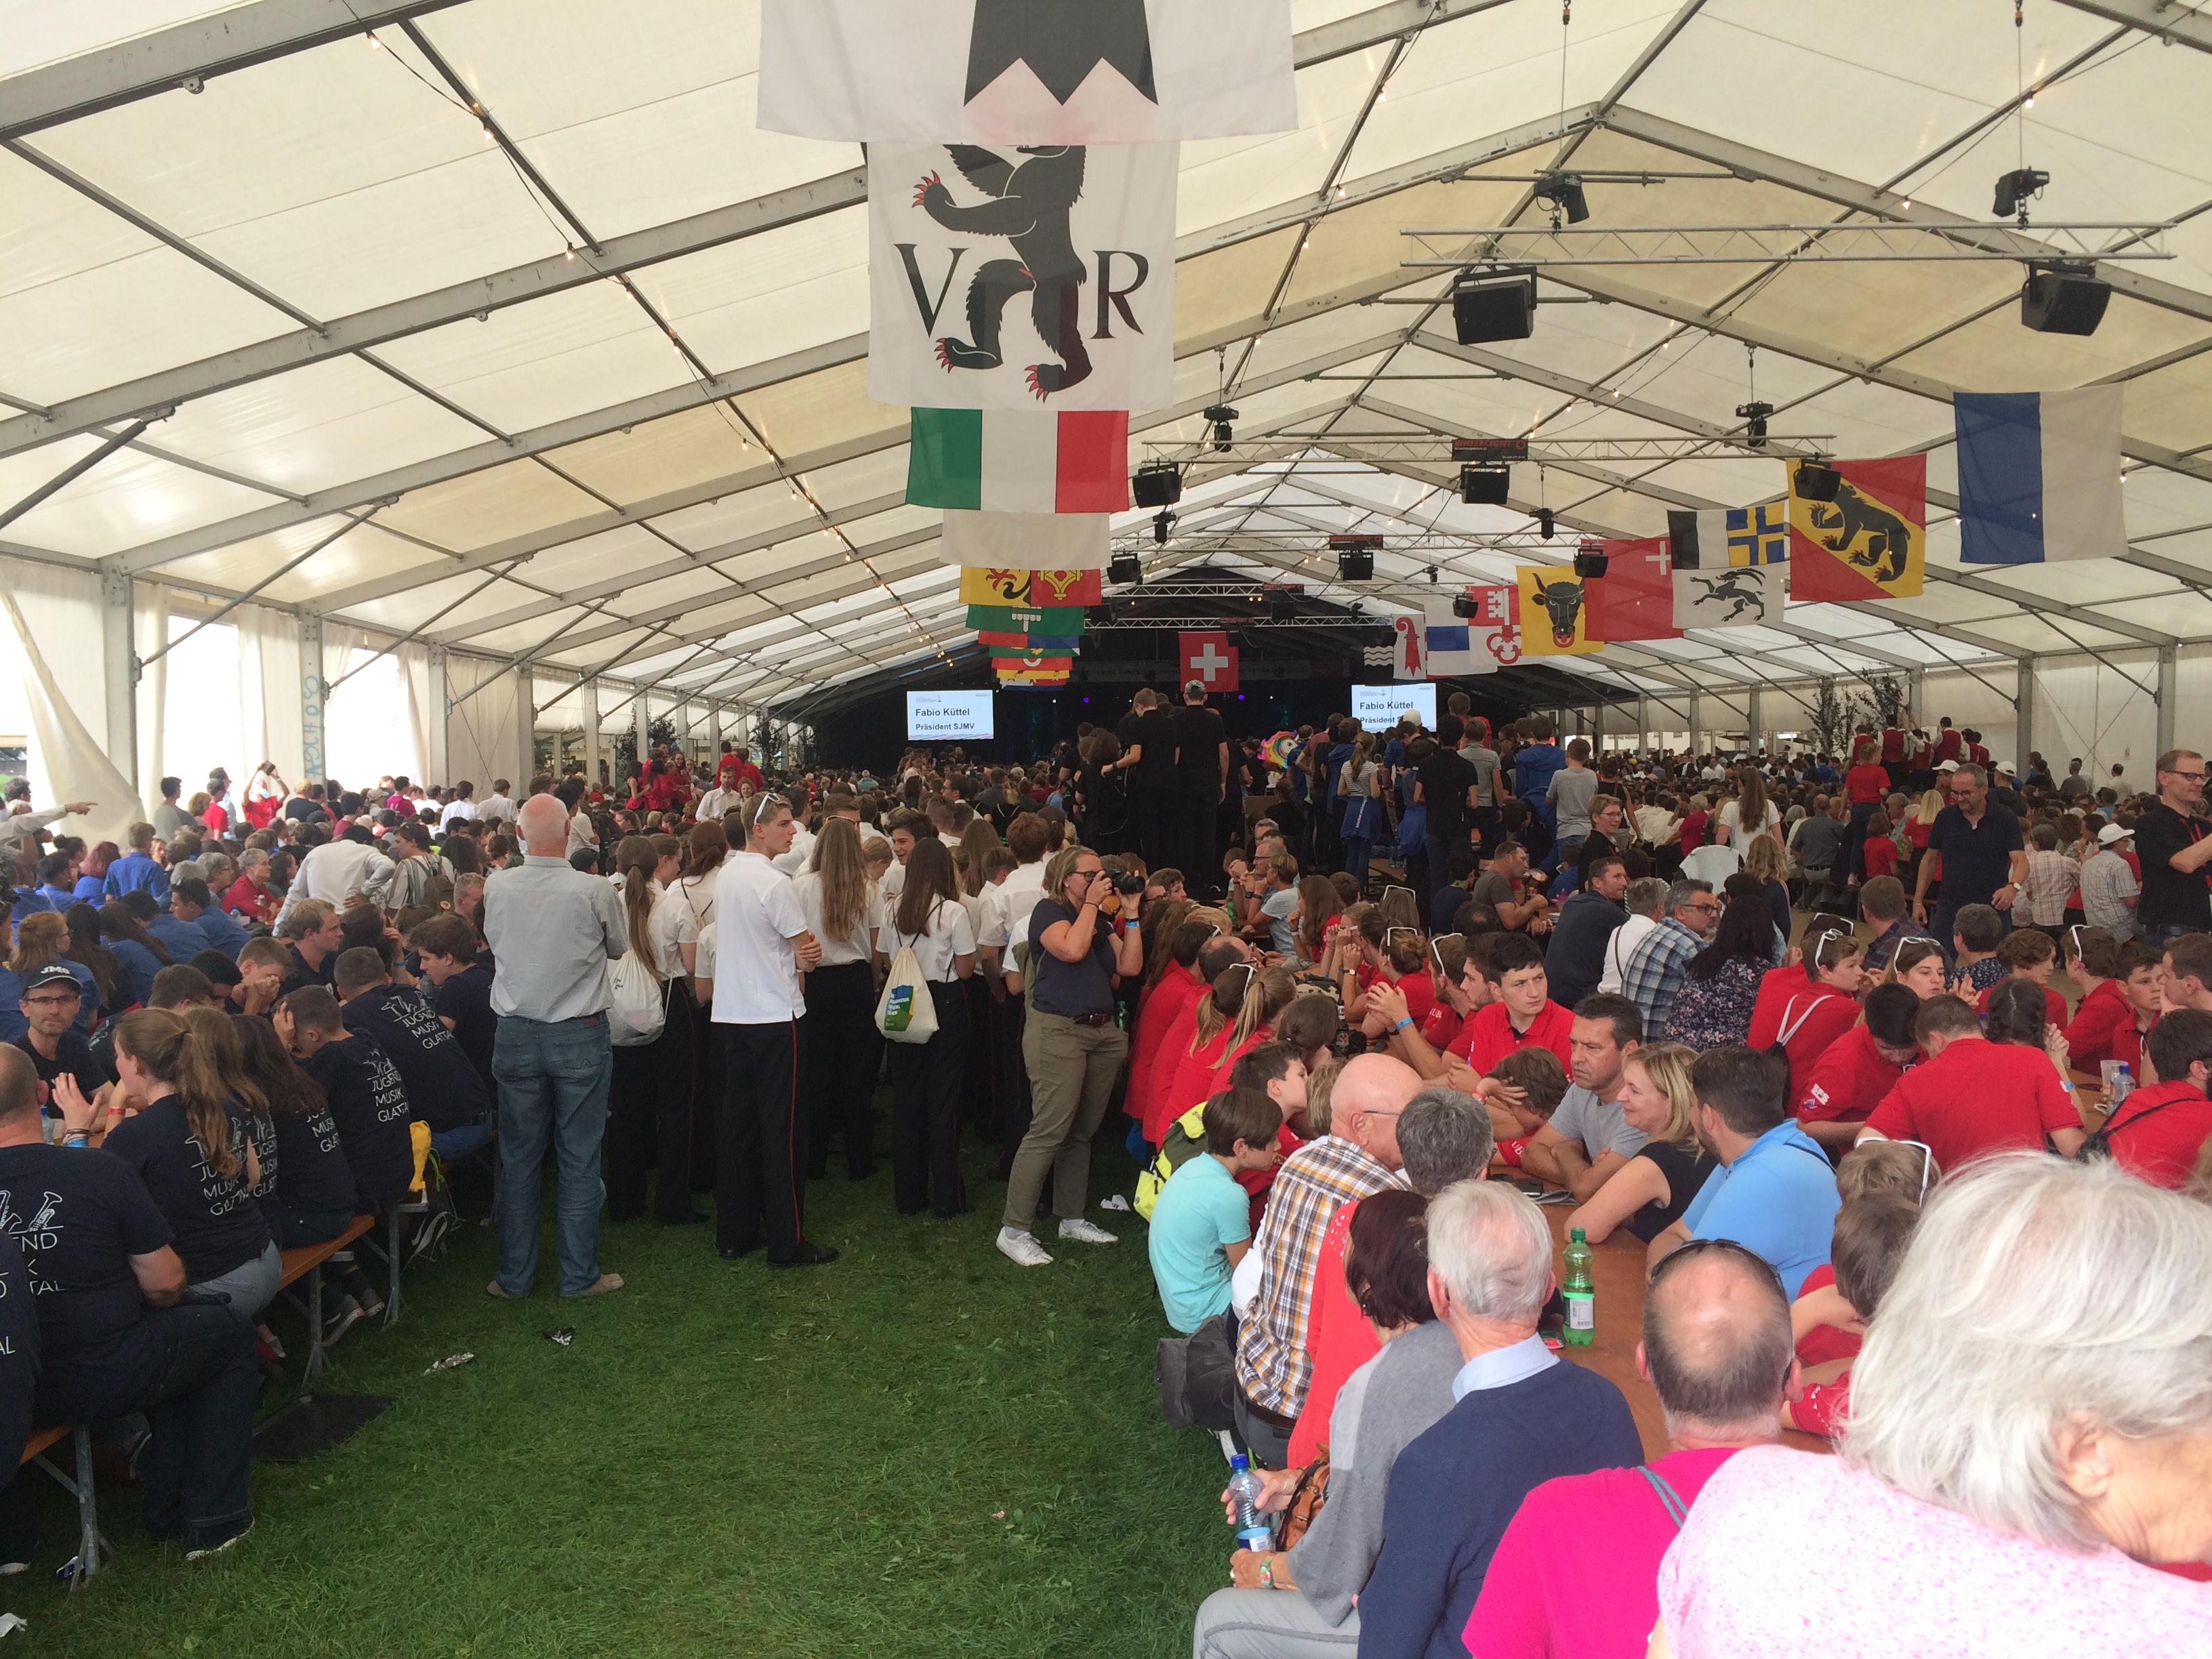 Schweizer Jugendmusikfest in Burgdorf, 21.-22. September 2019